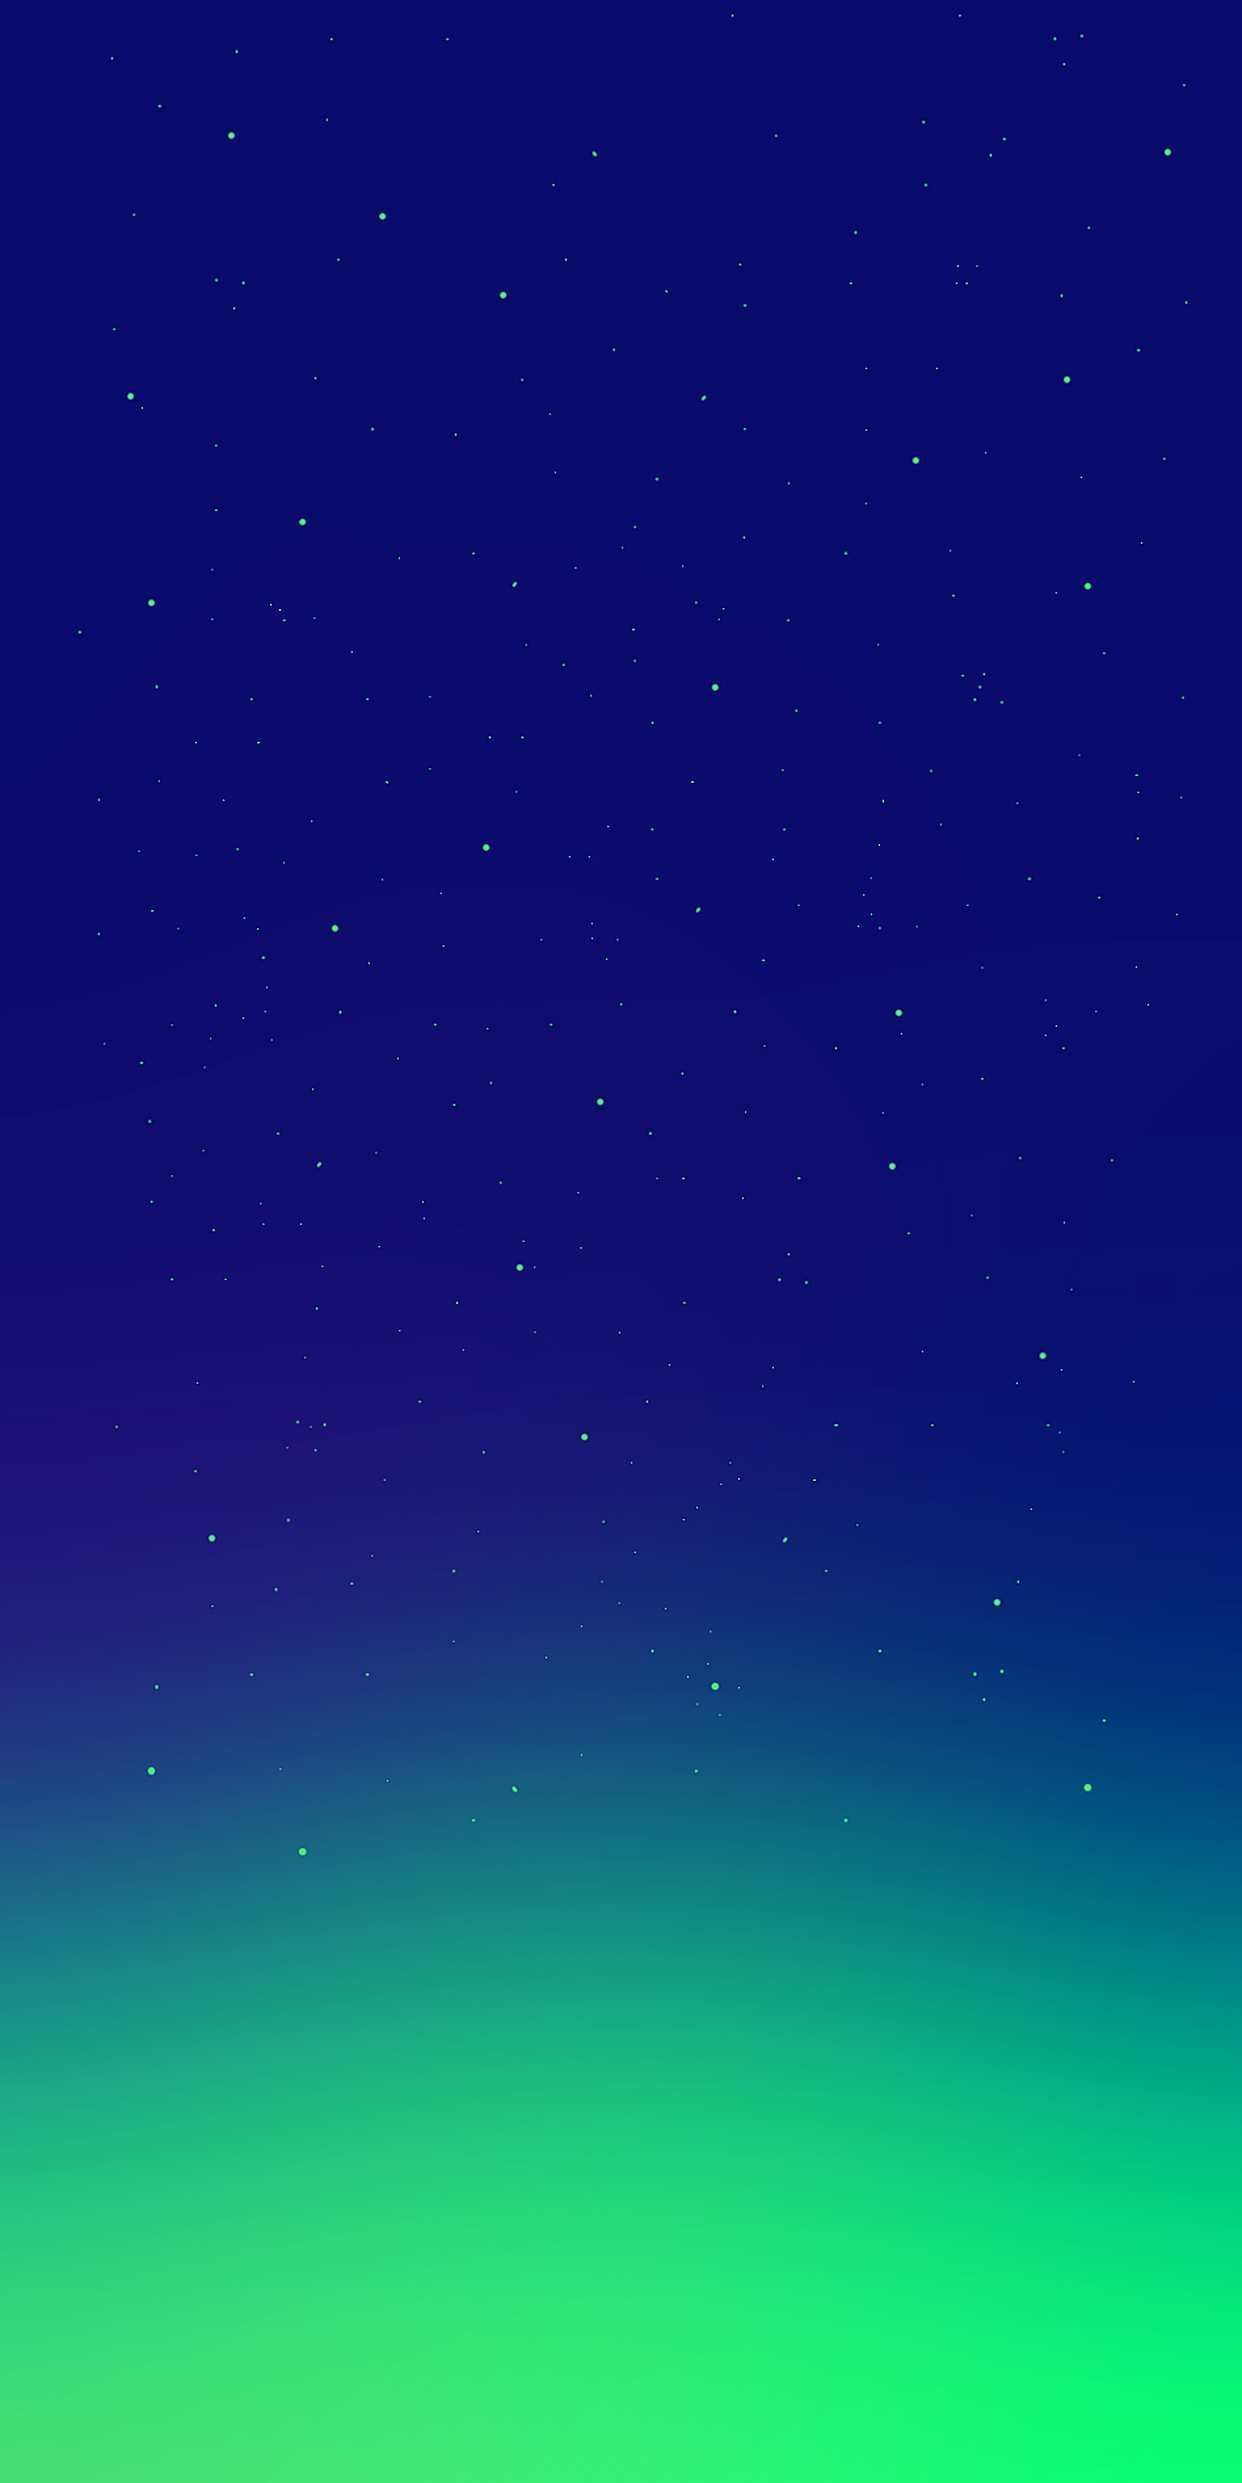 Download Iphone Xs Max Wallpaper Gradient Blue Wallpaper Iphone Iphone Wallpaper Qhd Wallpaper